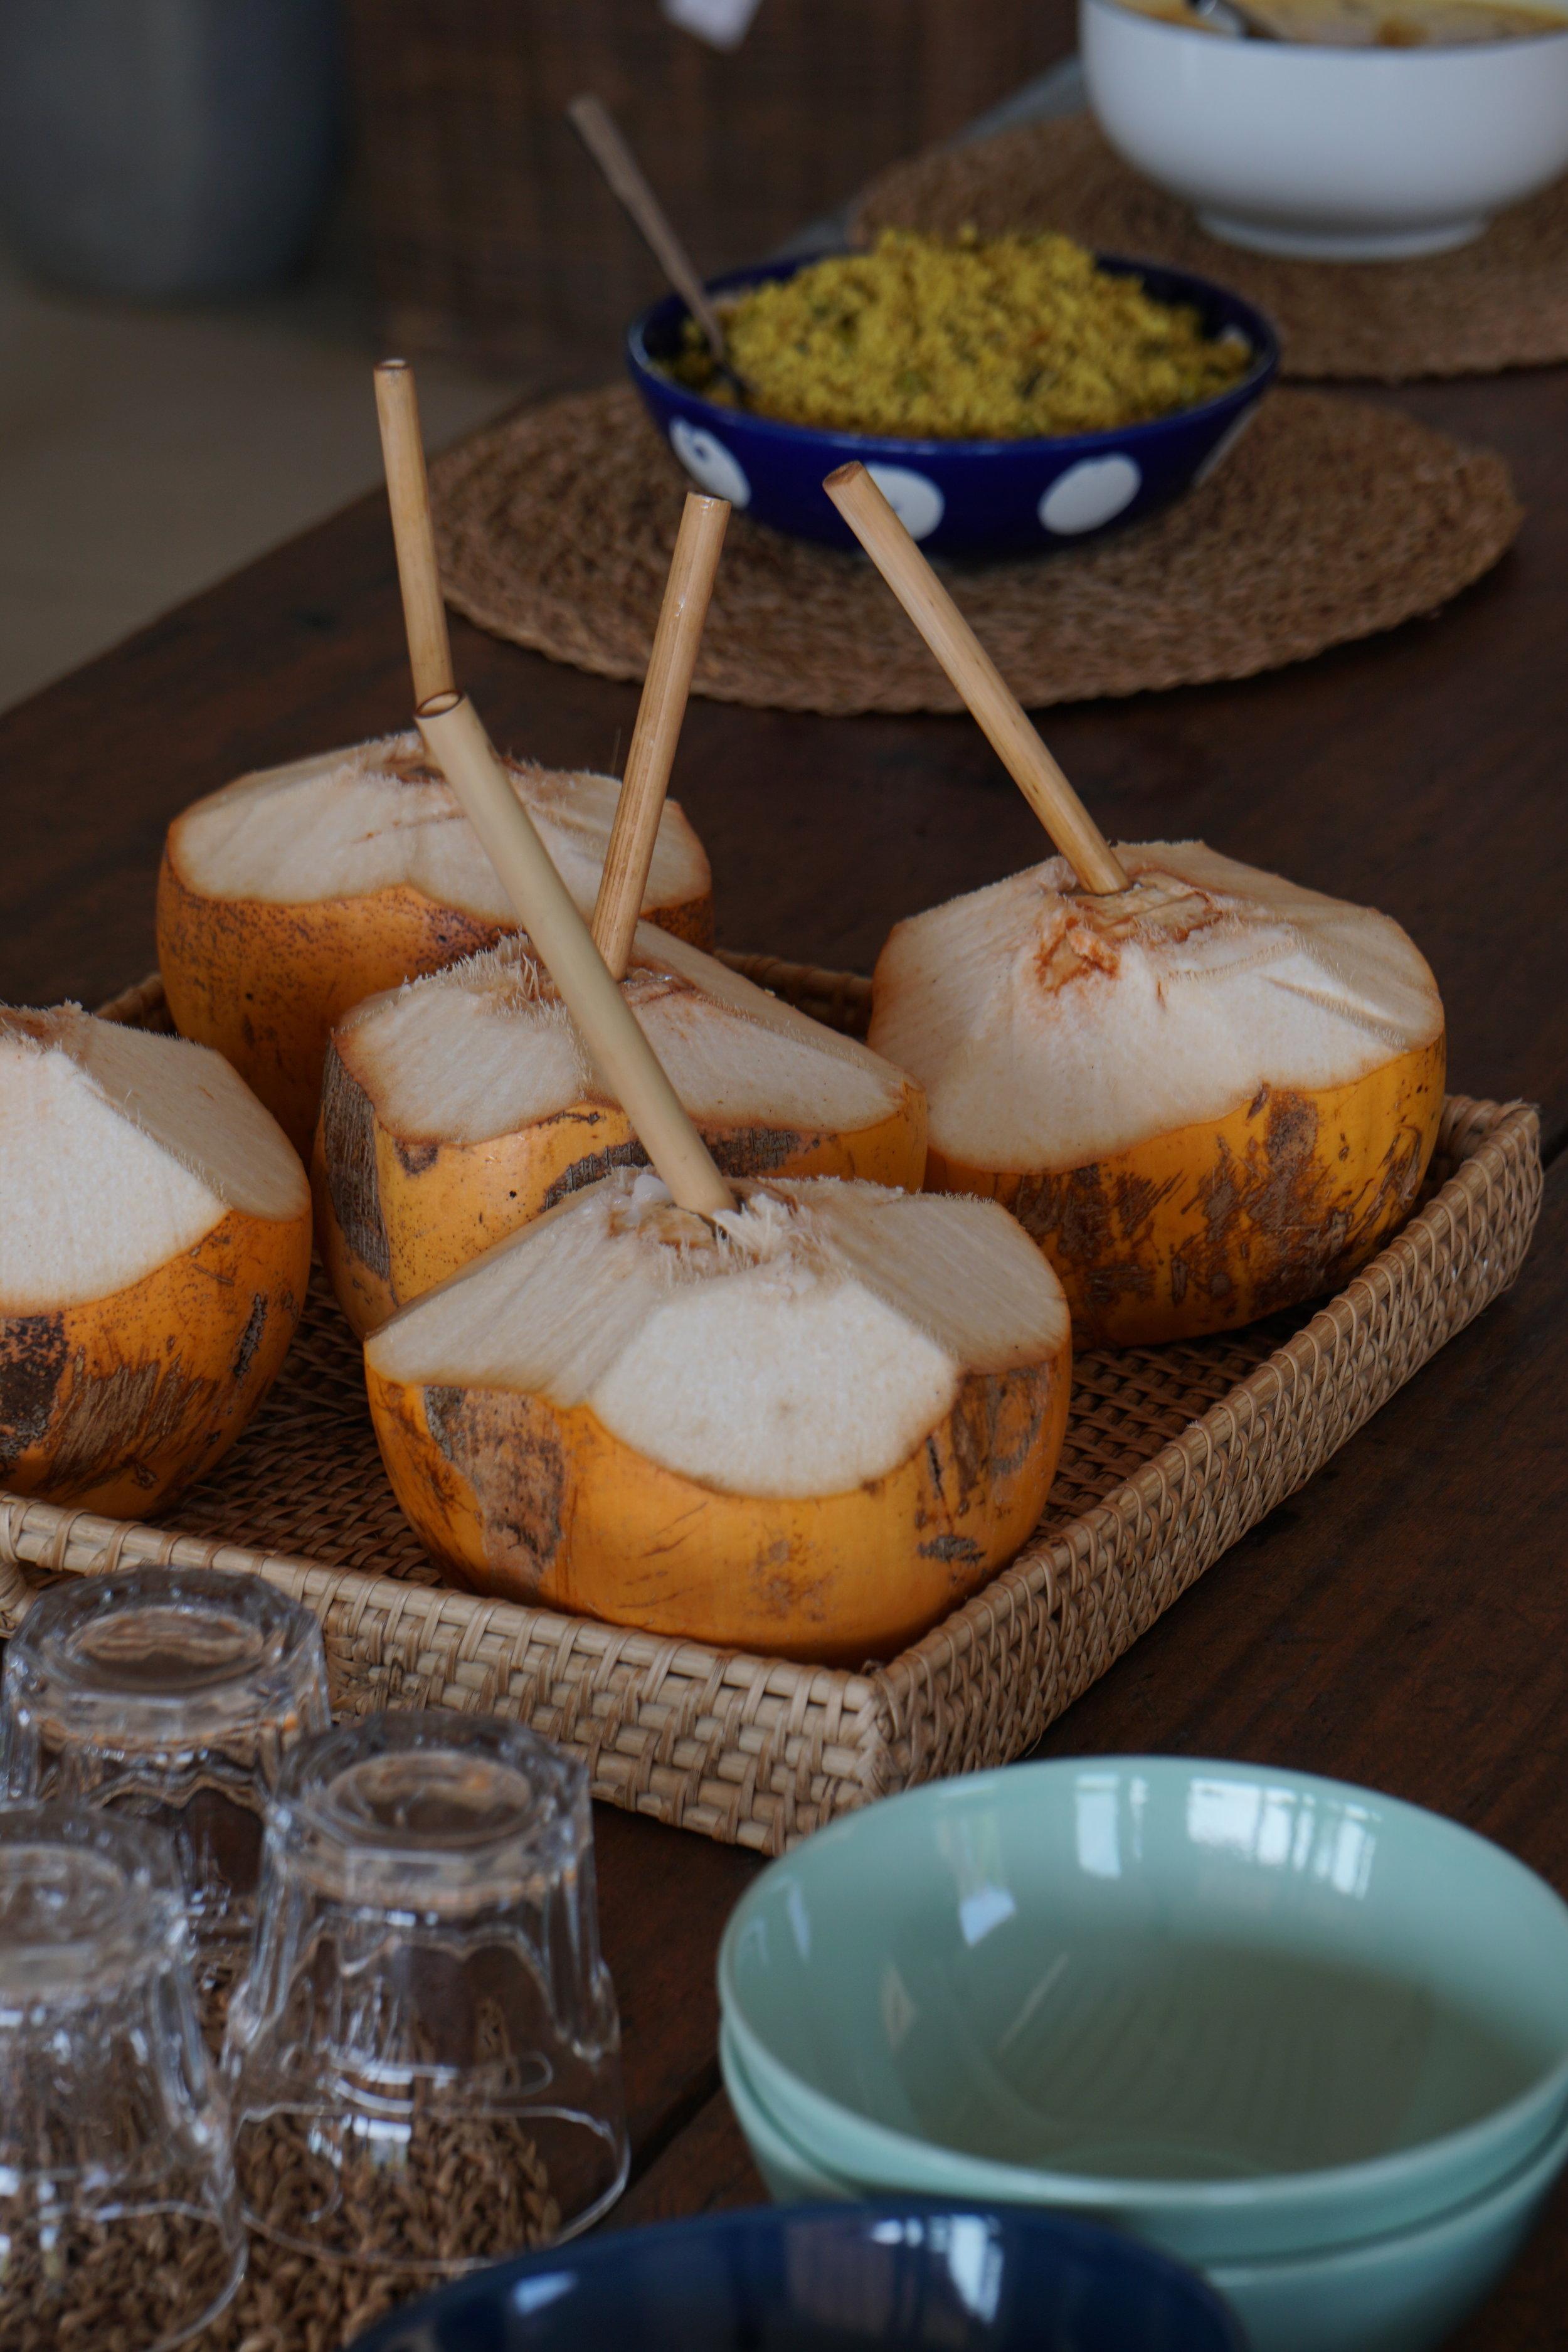 coconut king sri lanka yoga meditation ayurveda retreats budget women